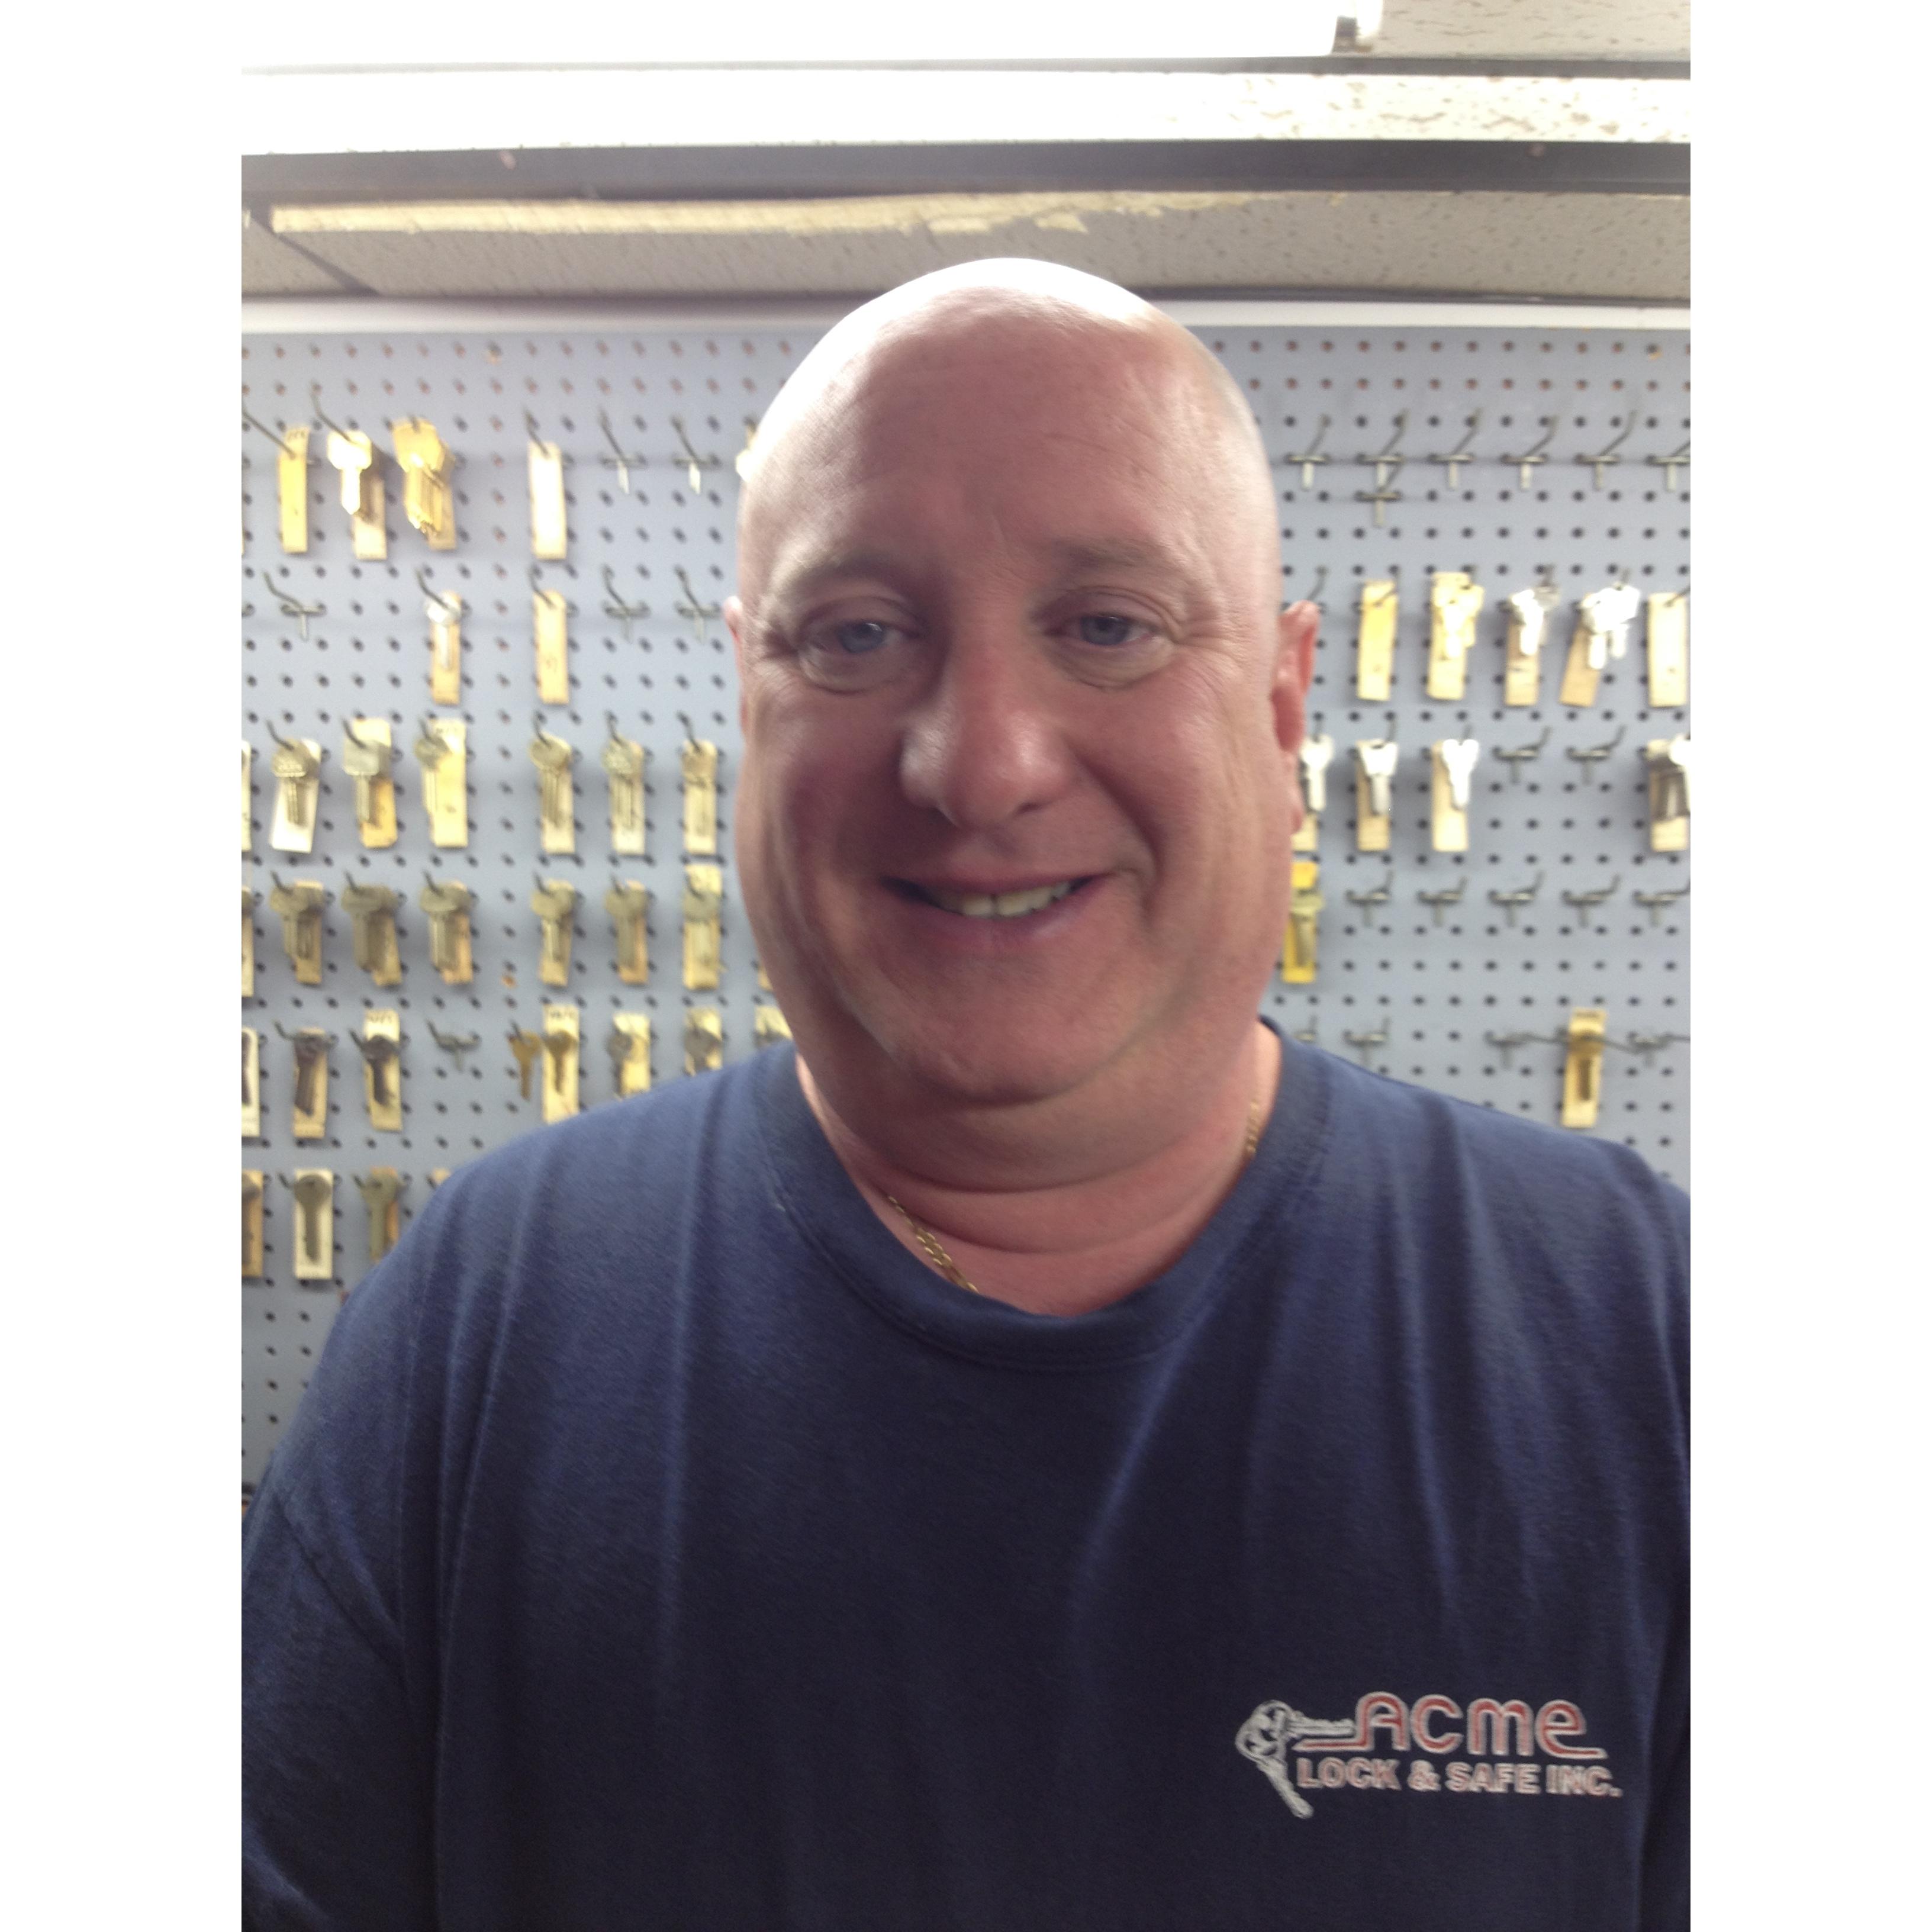 Acme Lock & Safe,Inc